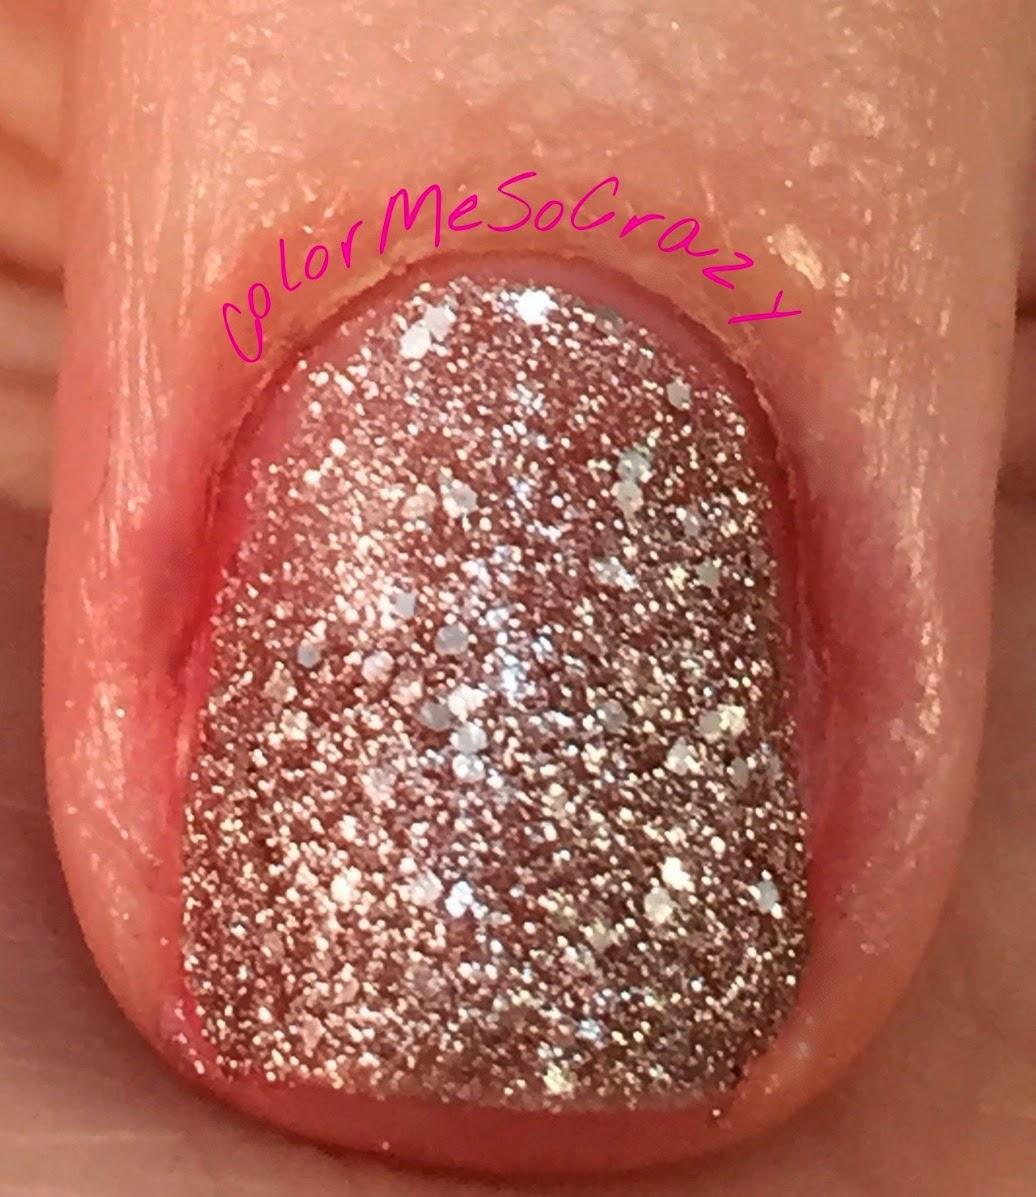 clubbing-girl-nail-polish, club-girl, gold-glitter-nail-polish, stripper-nail-polish, glitter-bomb